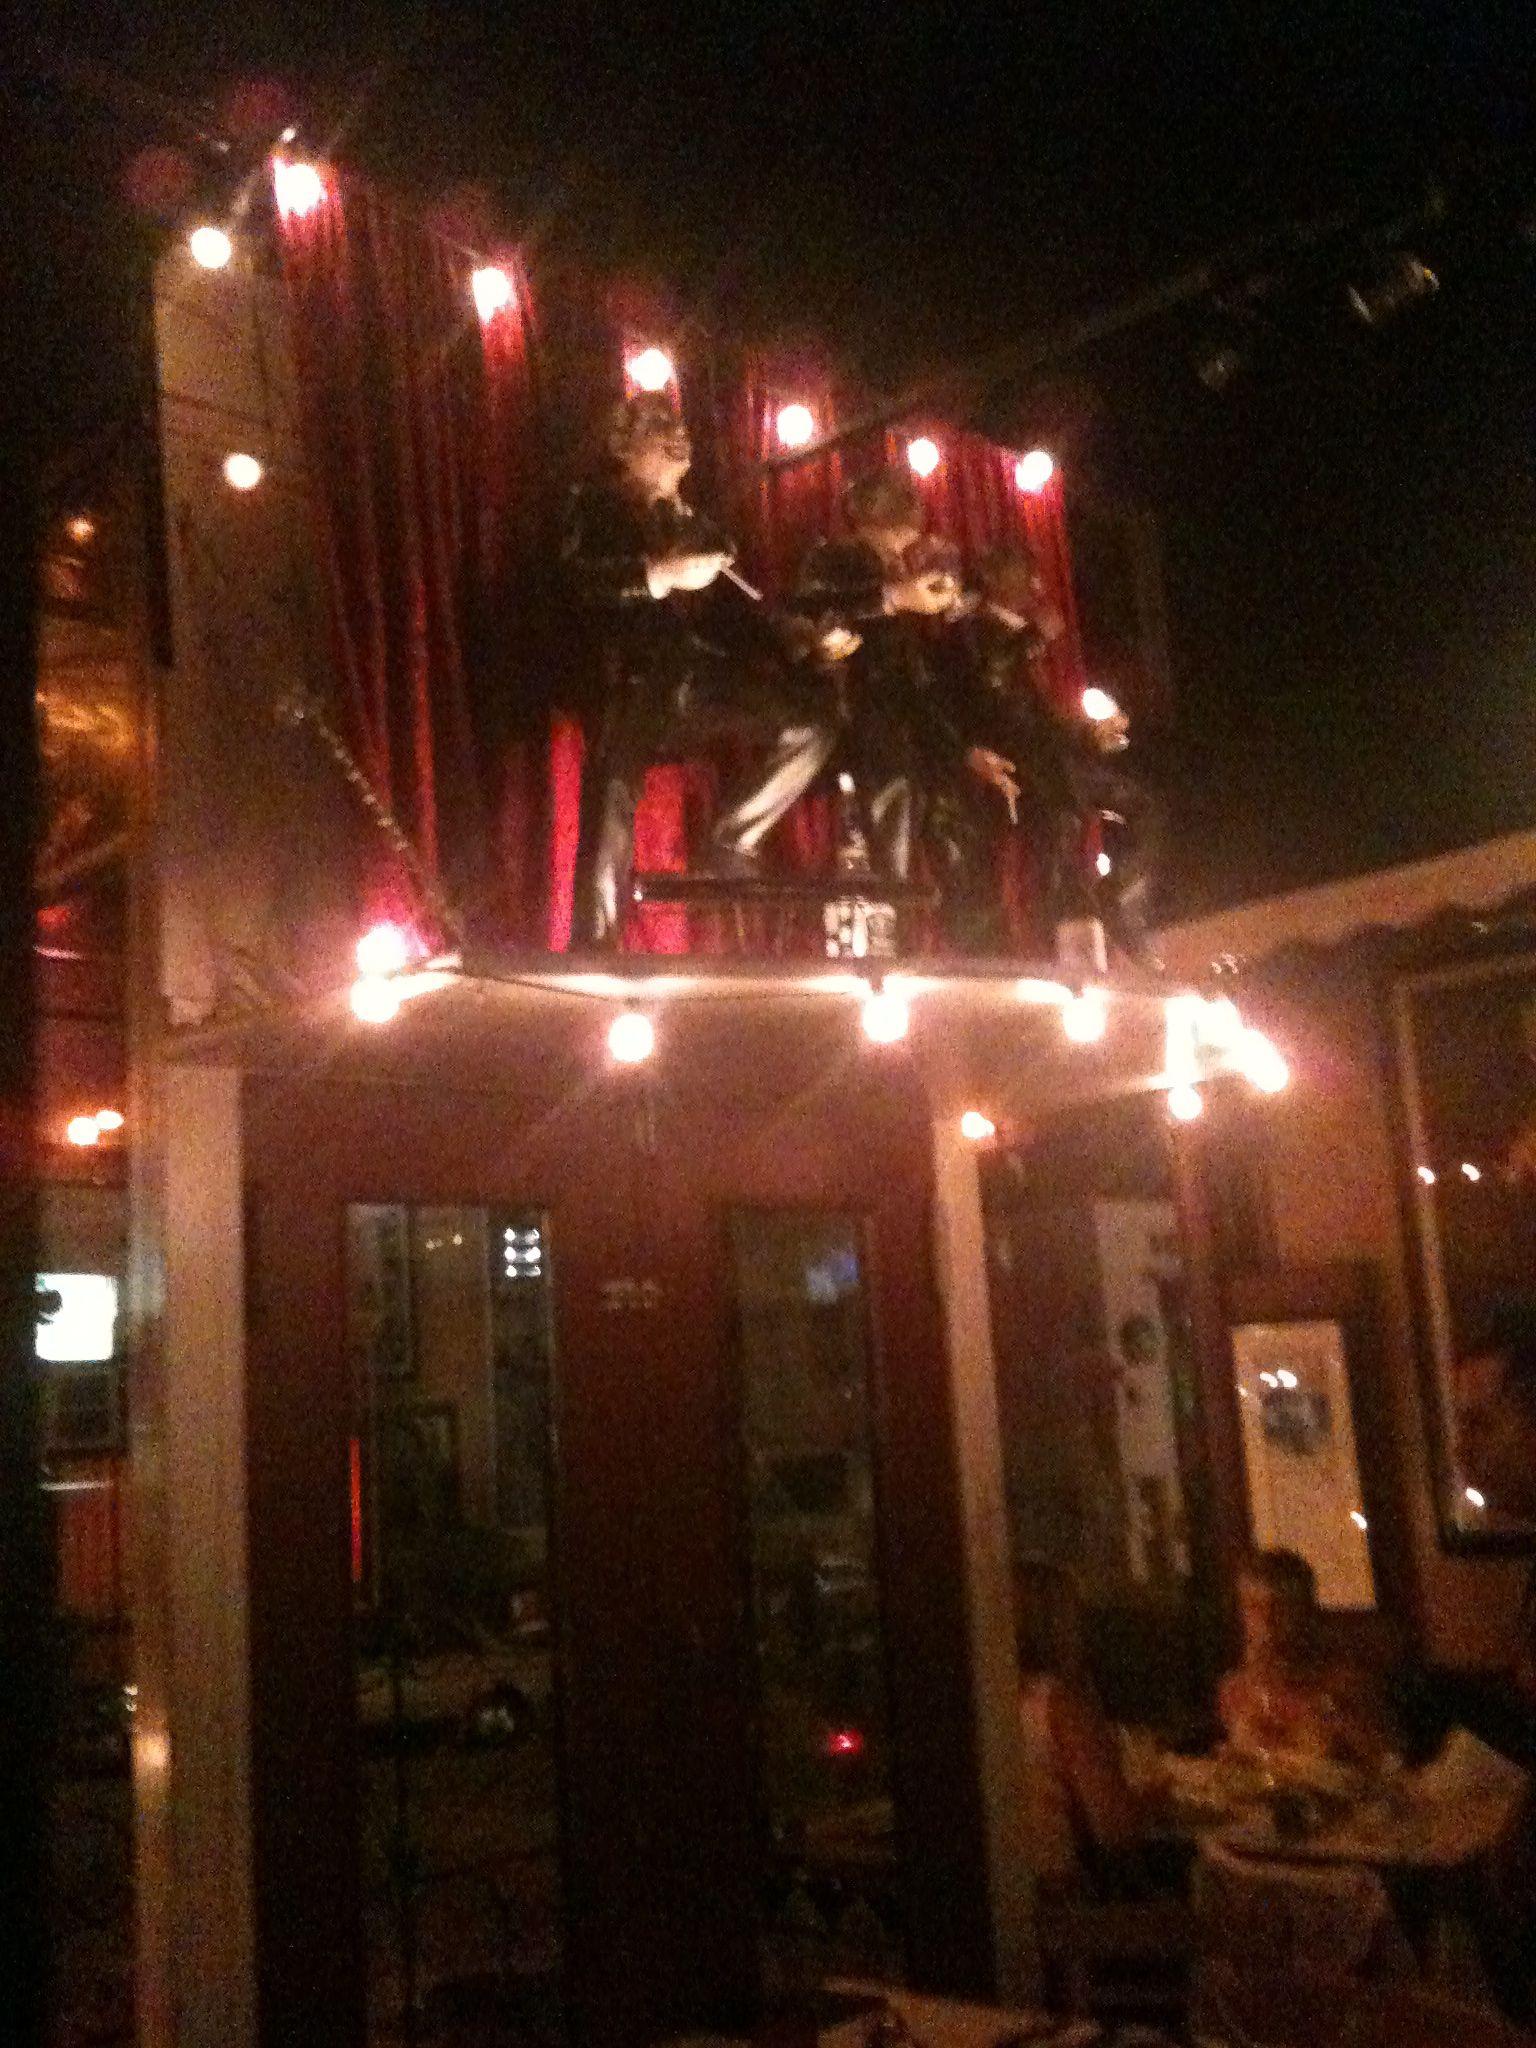 Italian restaurant. San Francisco, CA. (With images